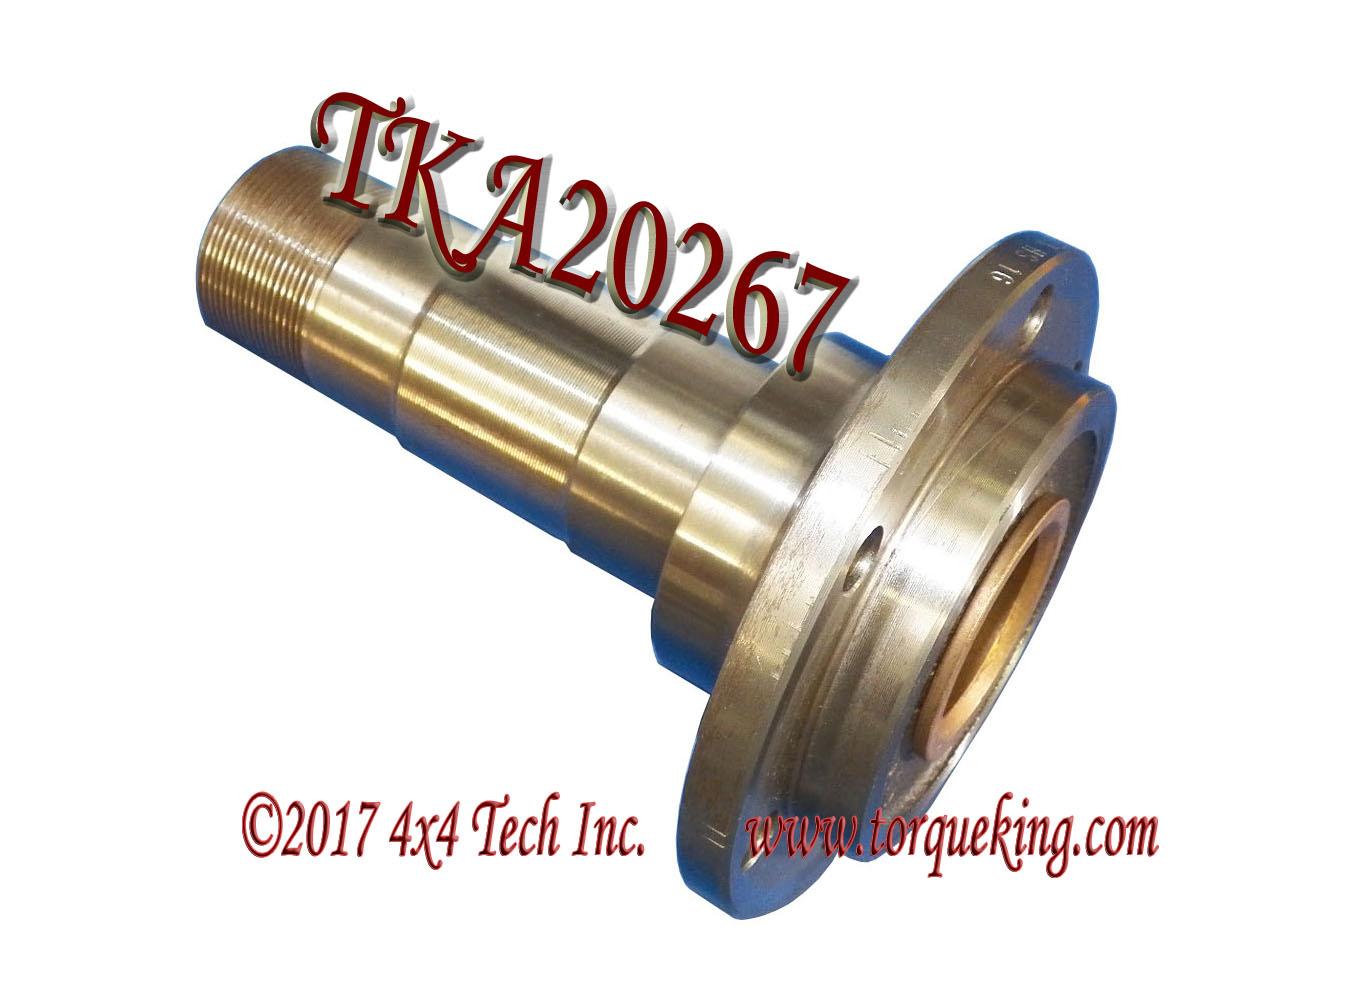 qu20267 - Torque King 4x4